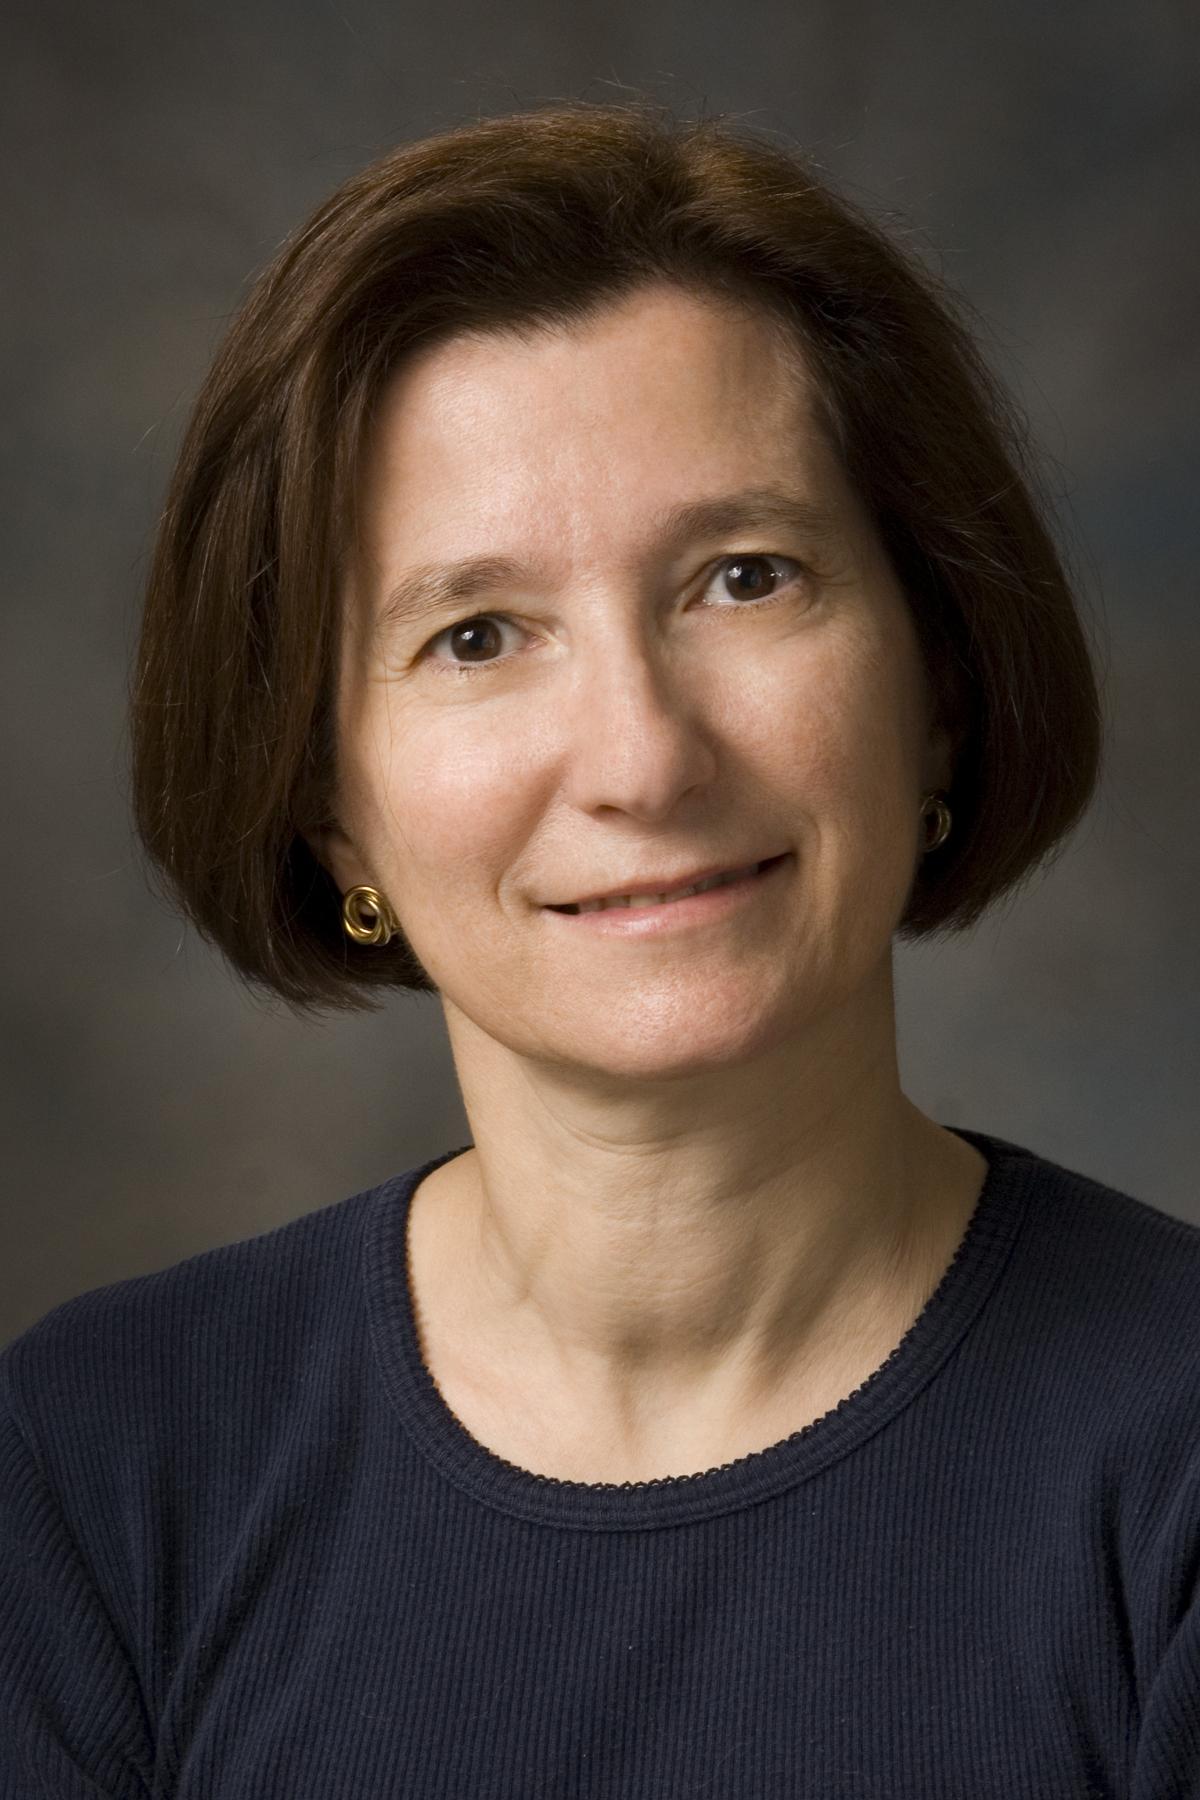 Alessandra Ferrajoli, MD